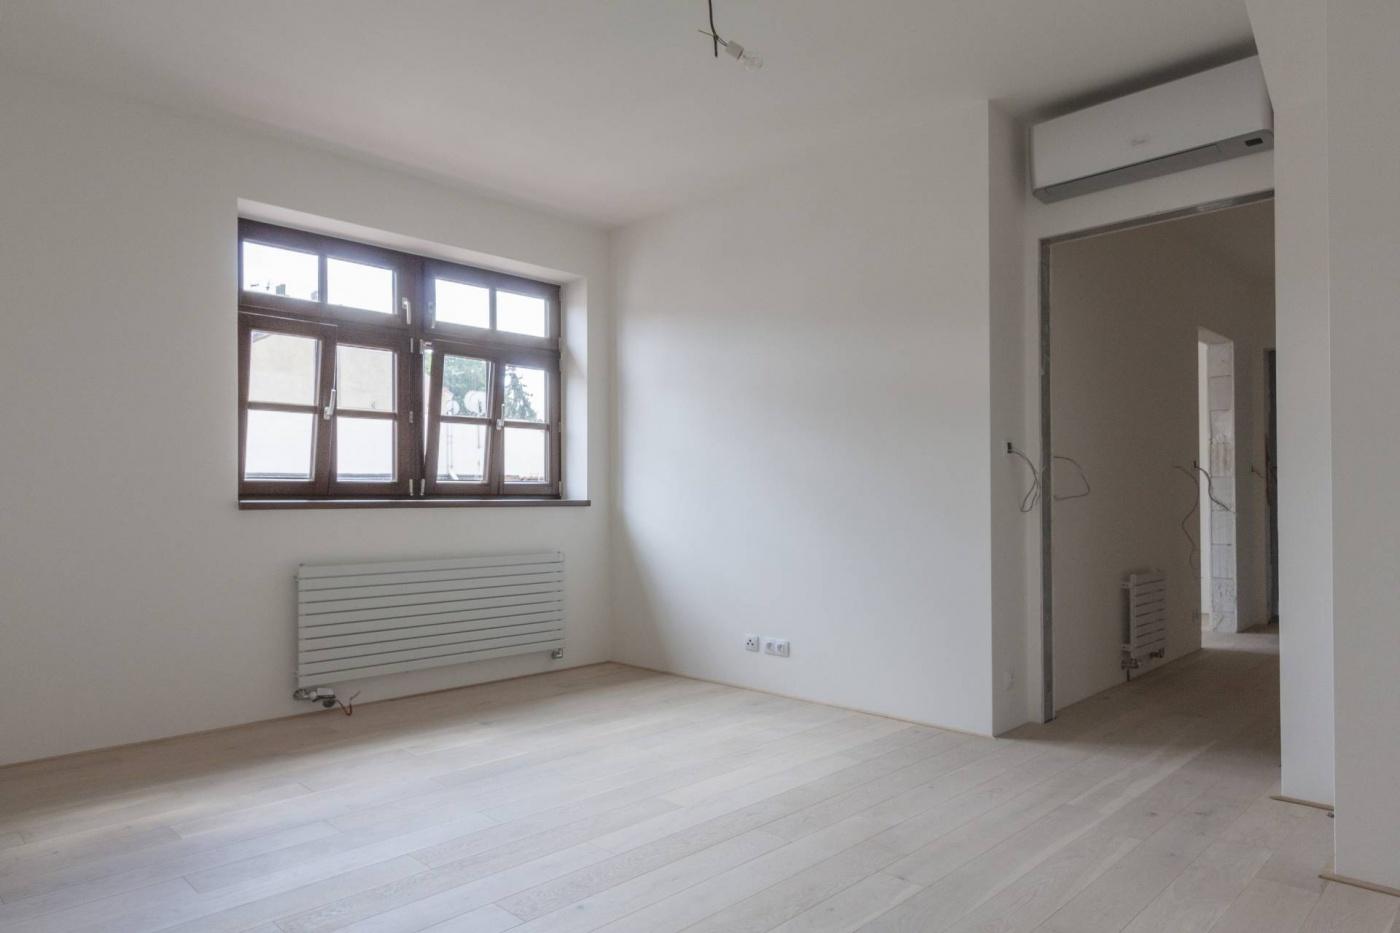 Půdní byt 3+kk, plocha 110 m², ulice Lumírova, Praha 2 - Vyšehrad | 23